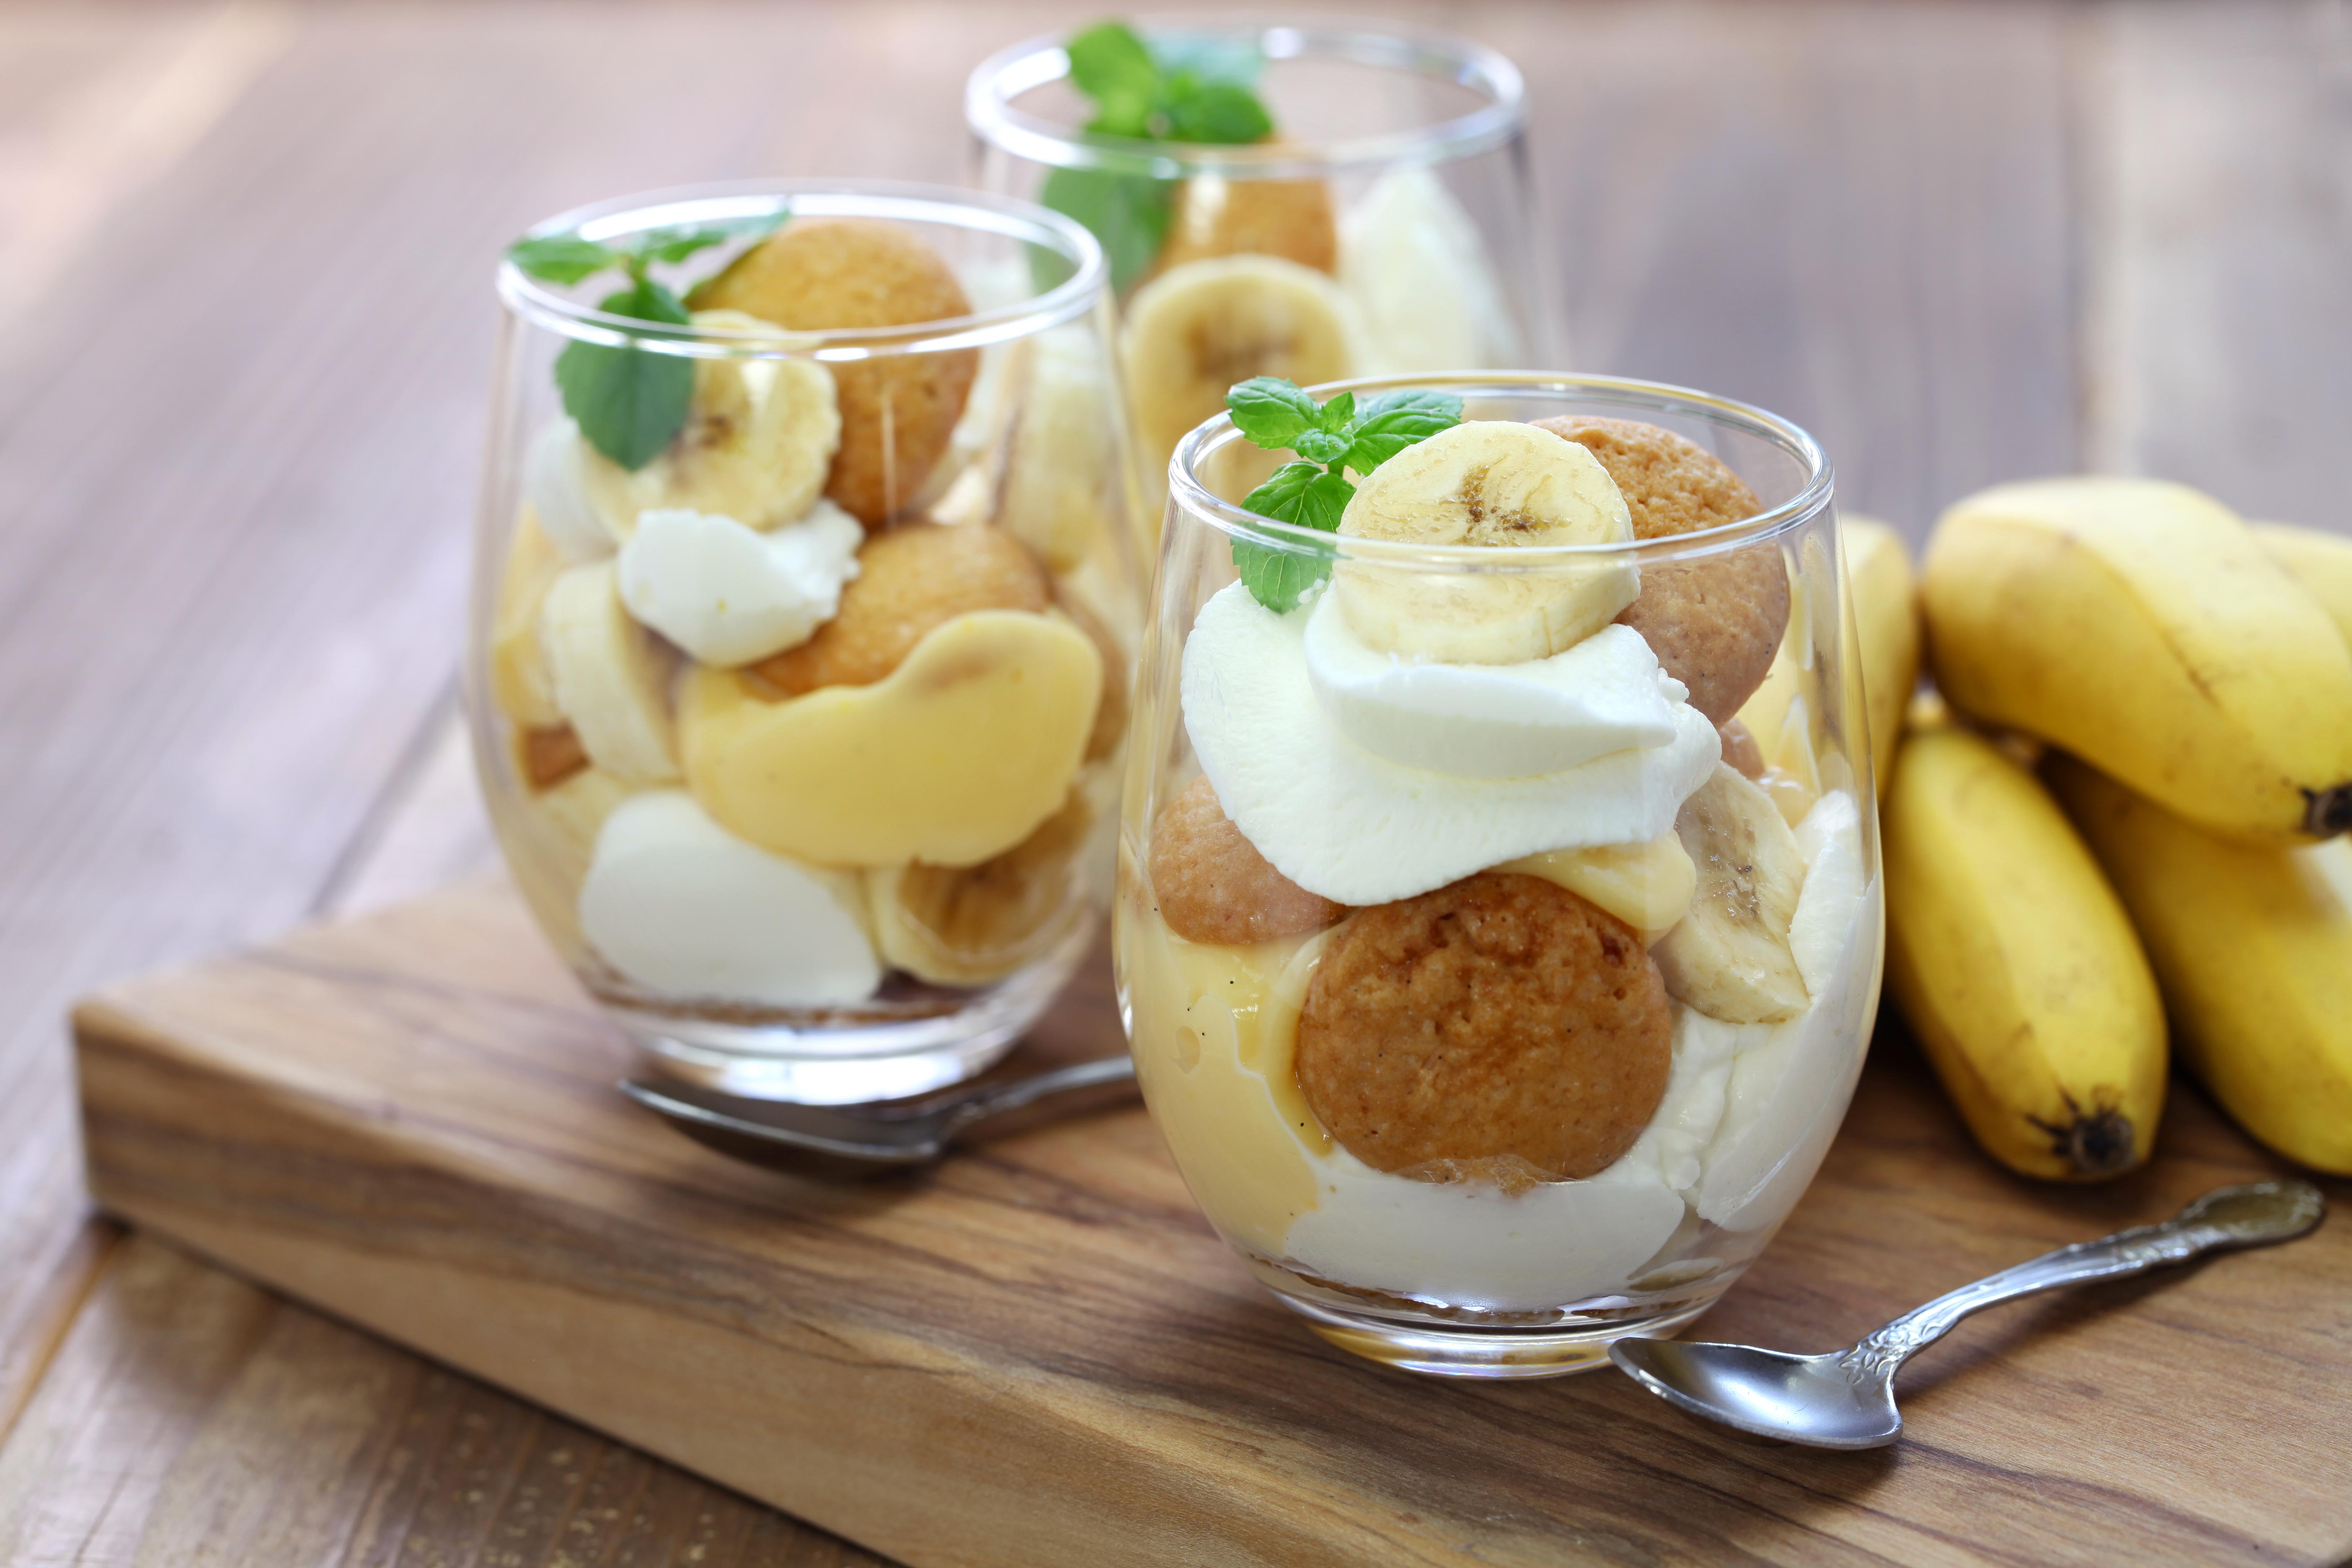 My Nana's Banana's Pudding